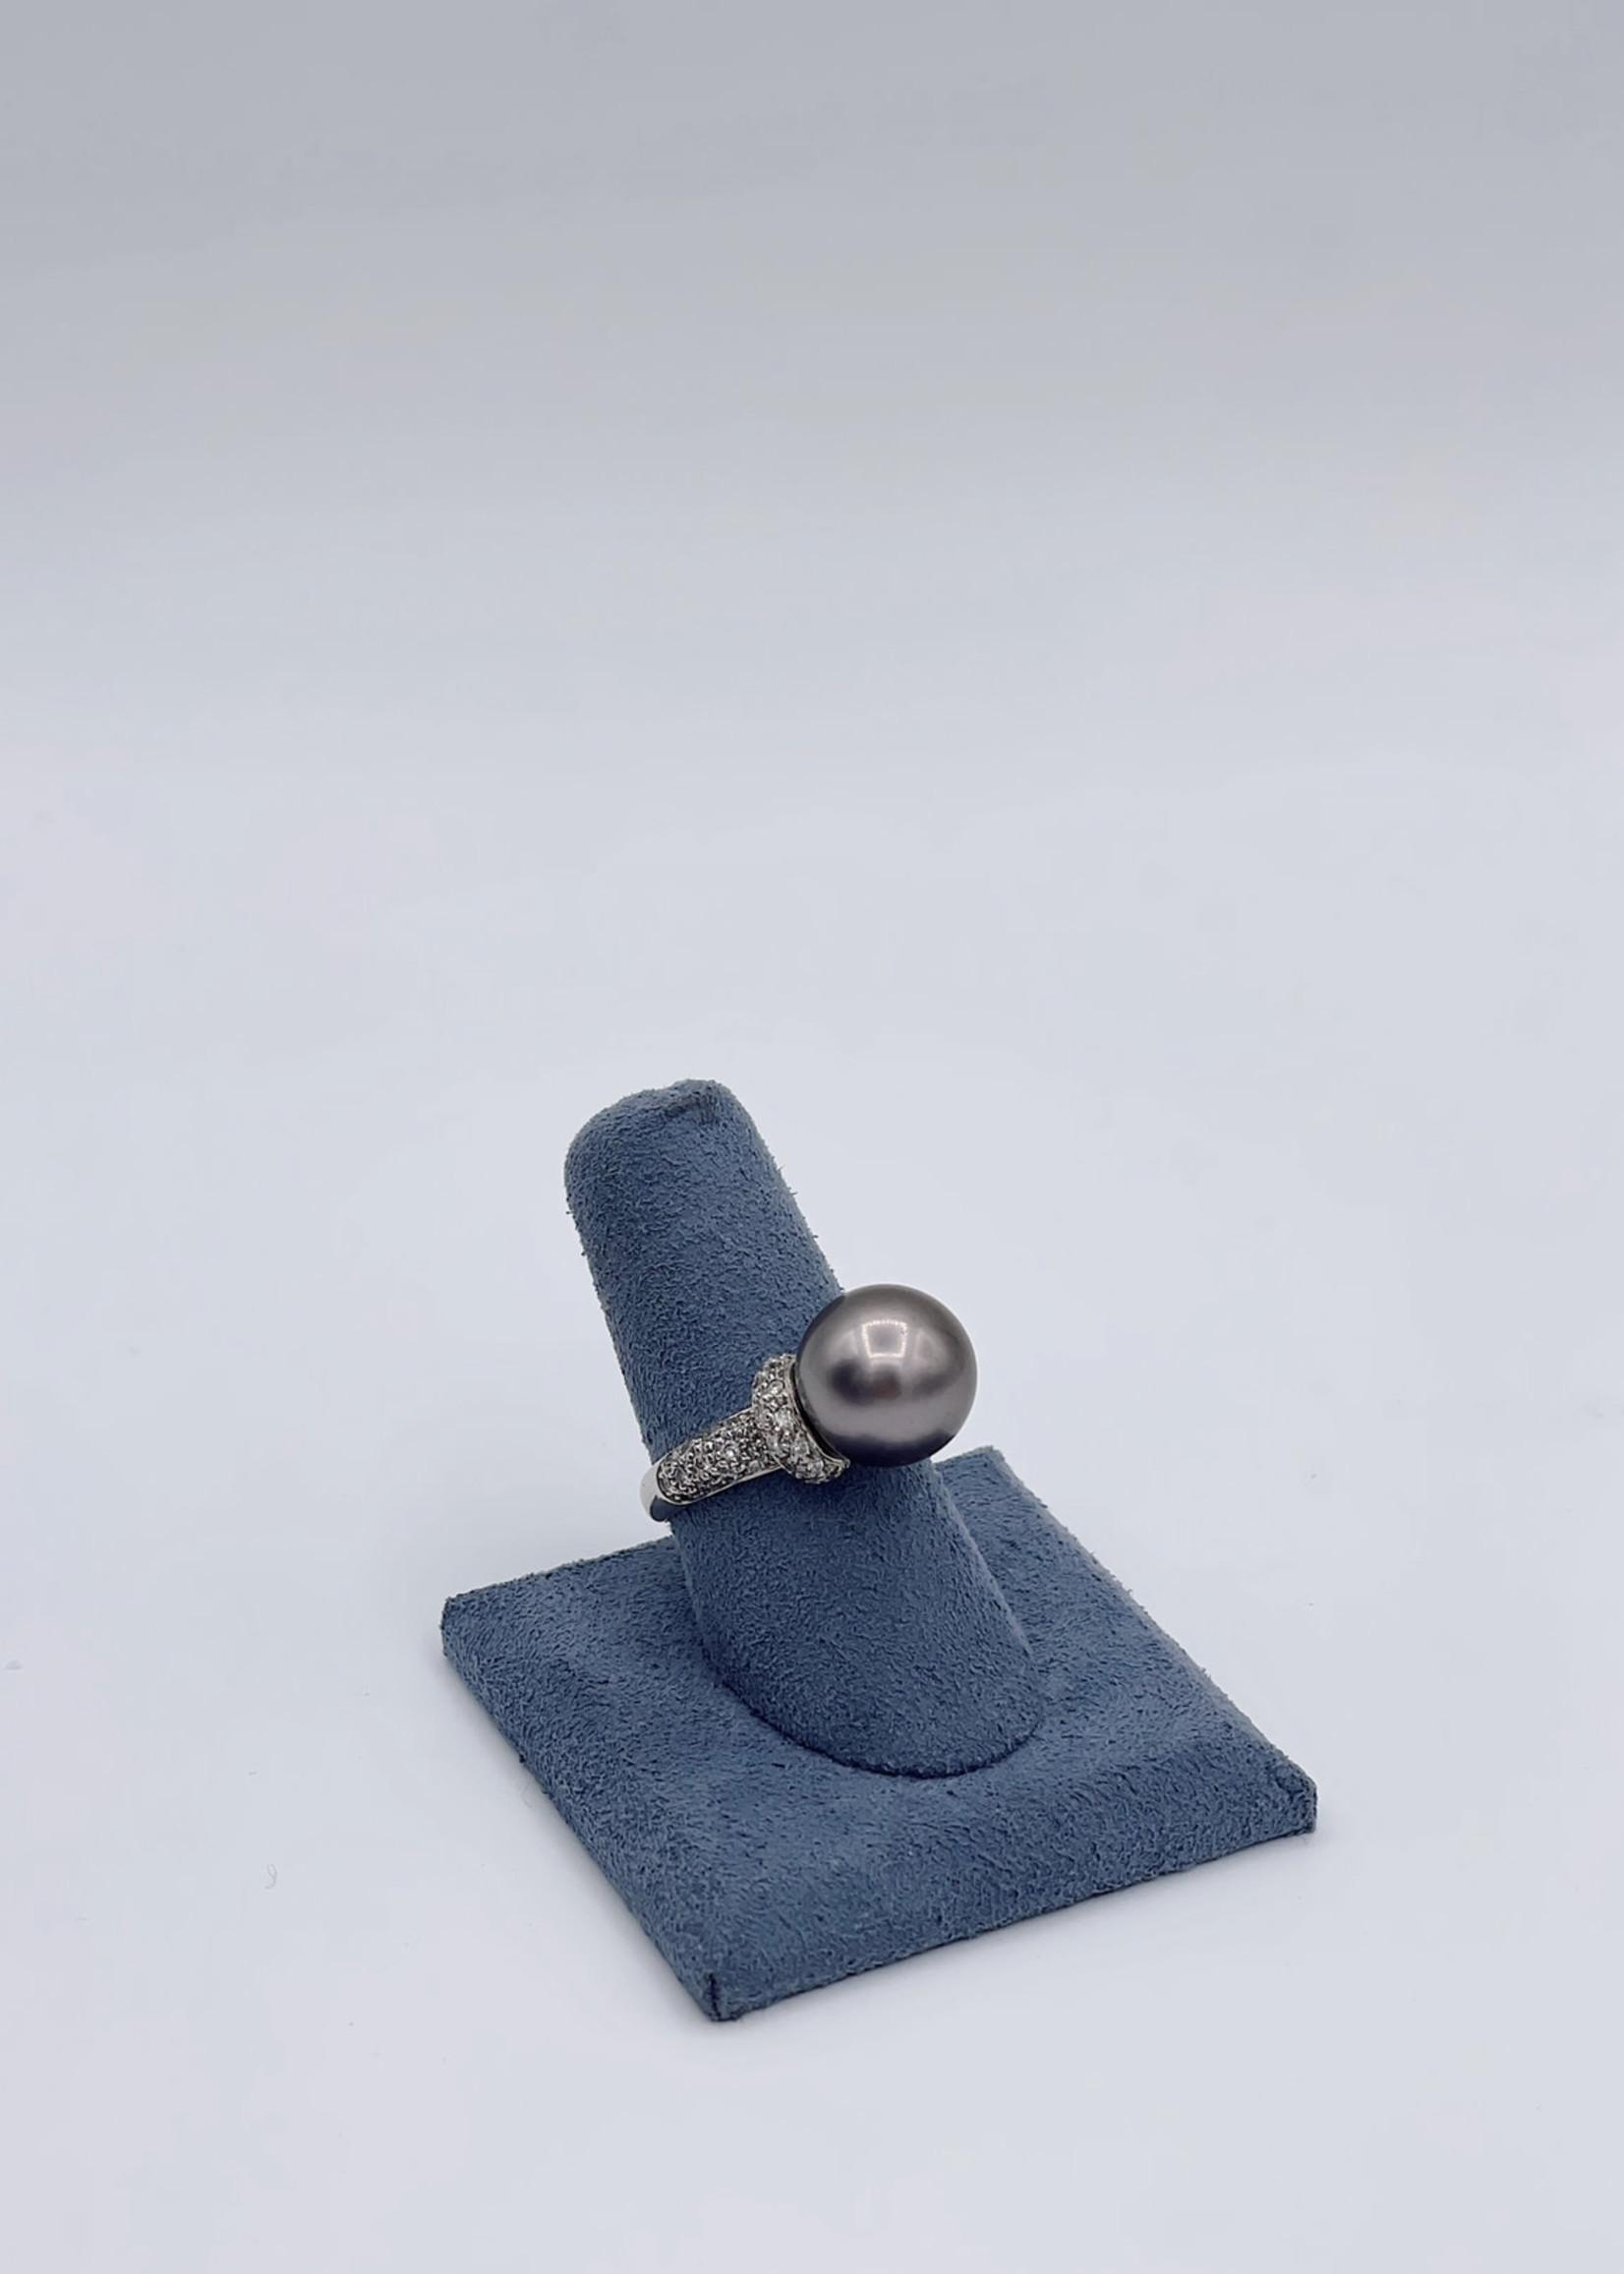 Imperial-Deltah Diamond Pearl 14k WG Ring